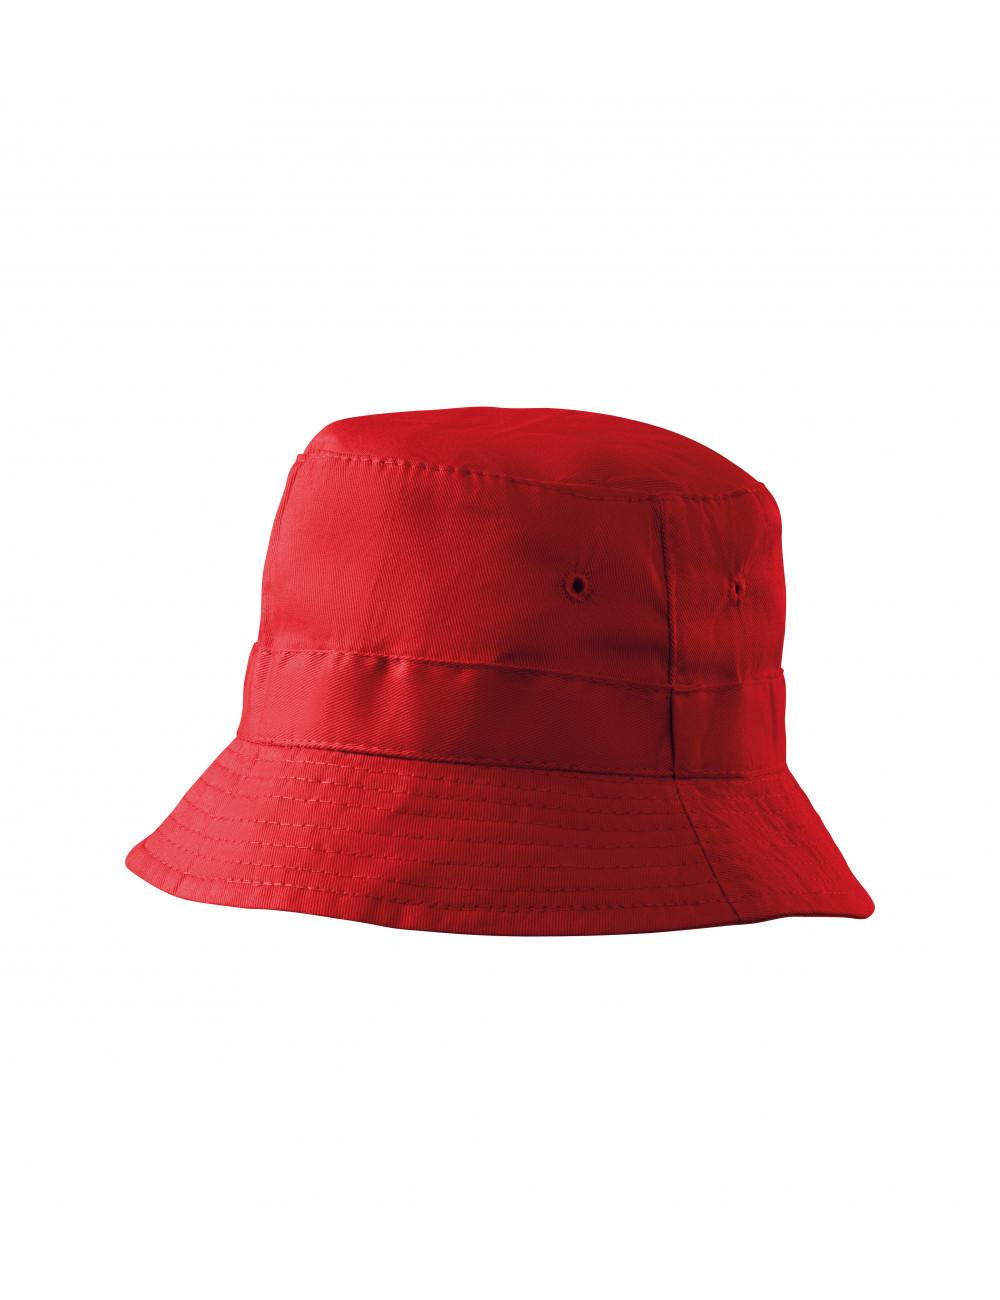 Adler MALFINI Kapelusik unisex Classic 304 czerwony